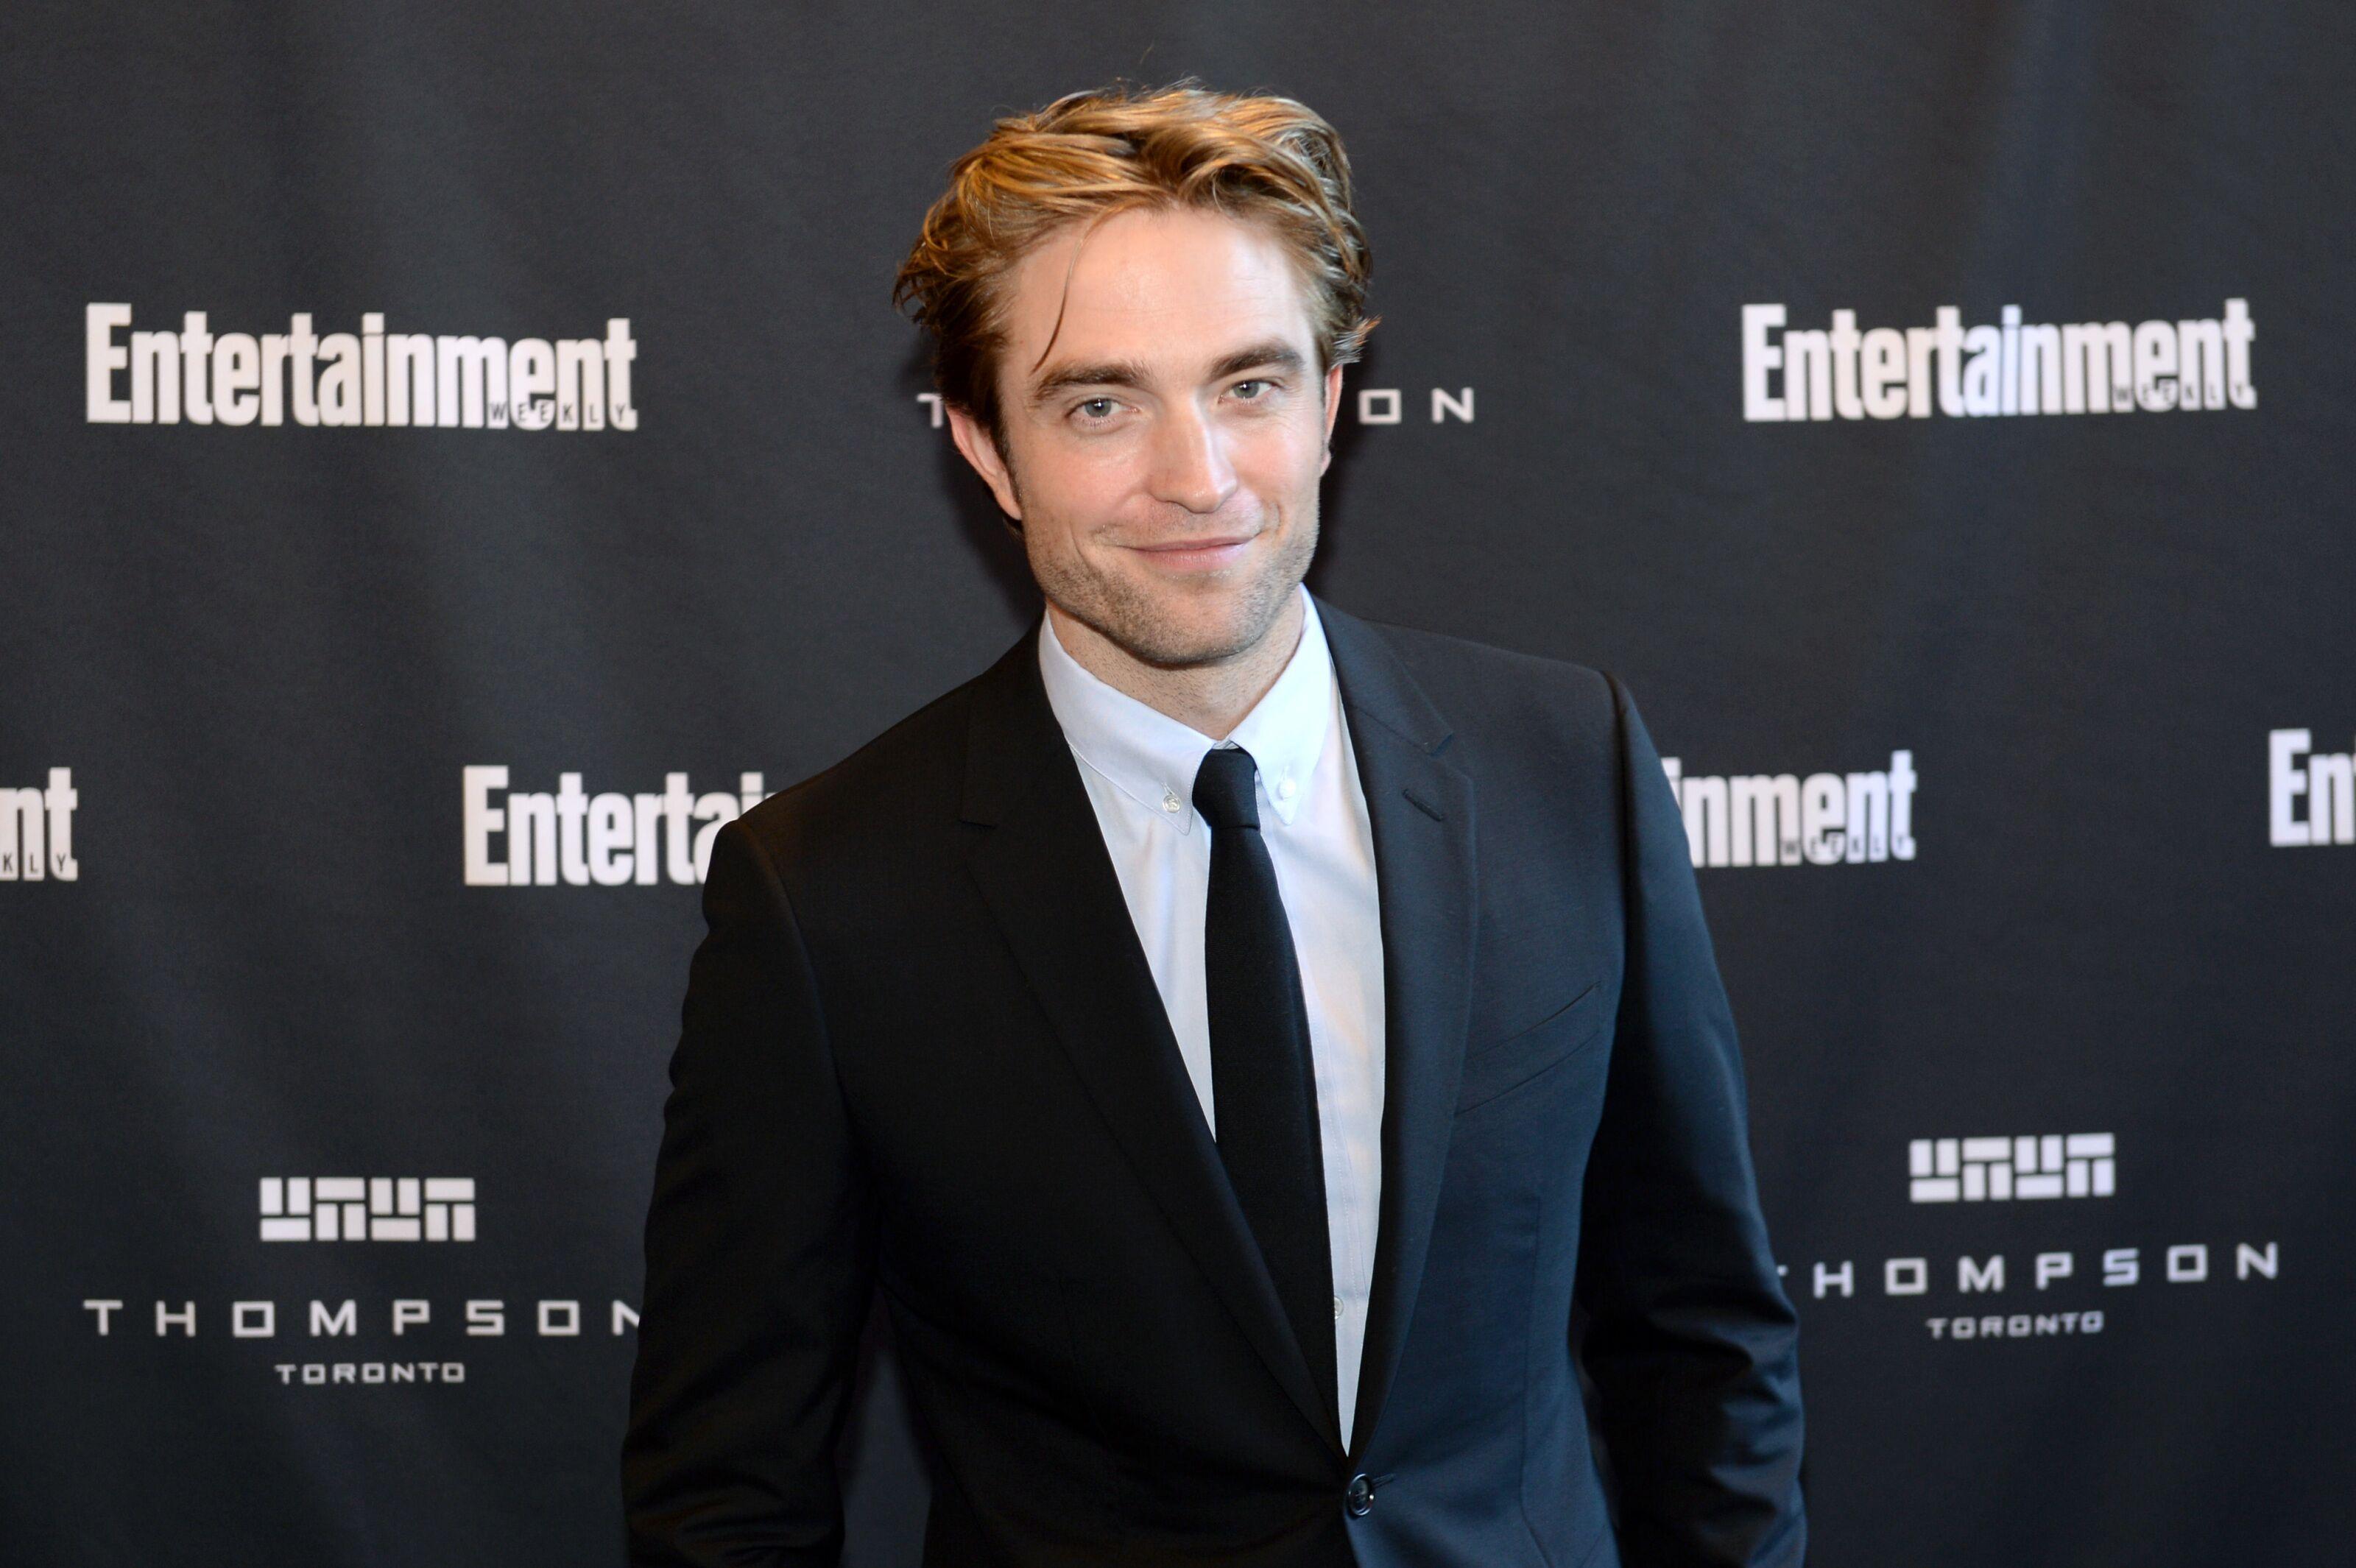 The Batman: Robert Pattinson applauds the direction of the solo film